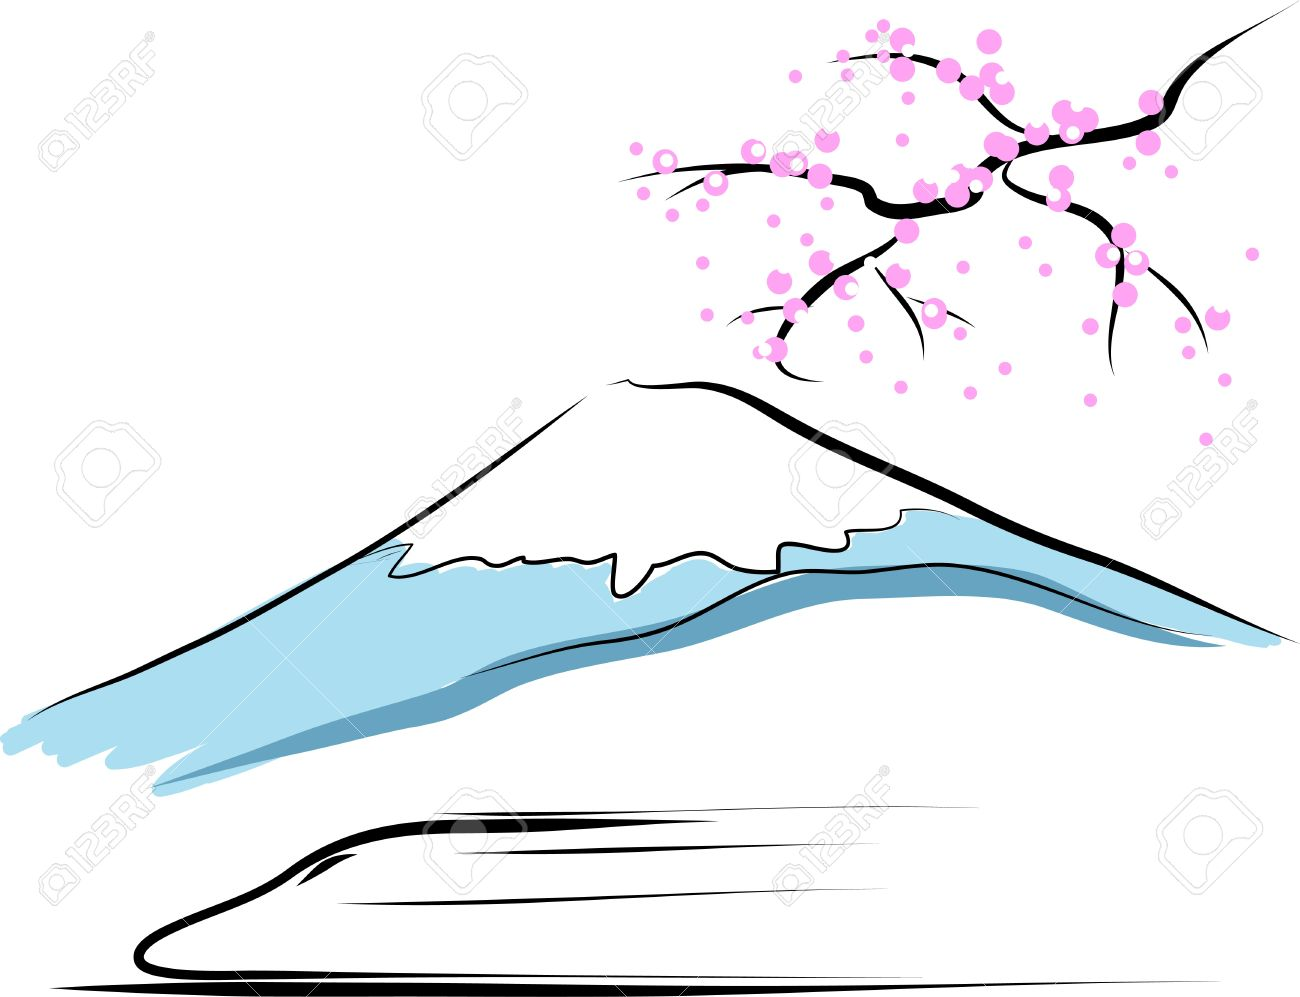 Mount Fuji Royalty Free Cliparts, Vectors, And Stock Illustration.